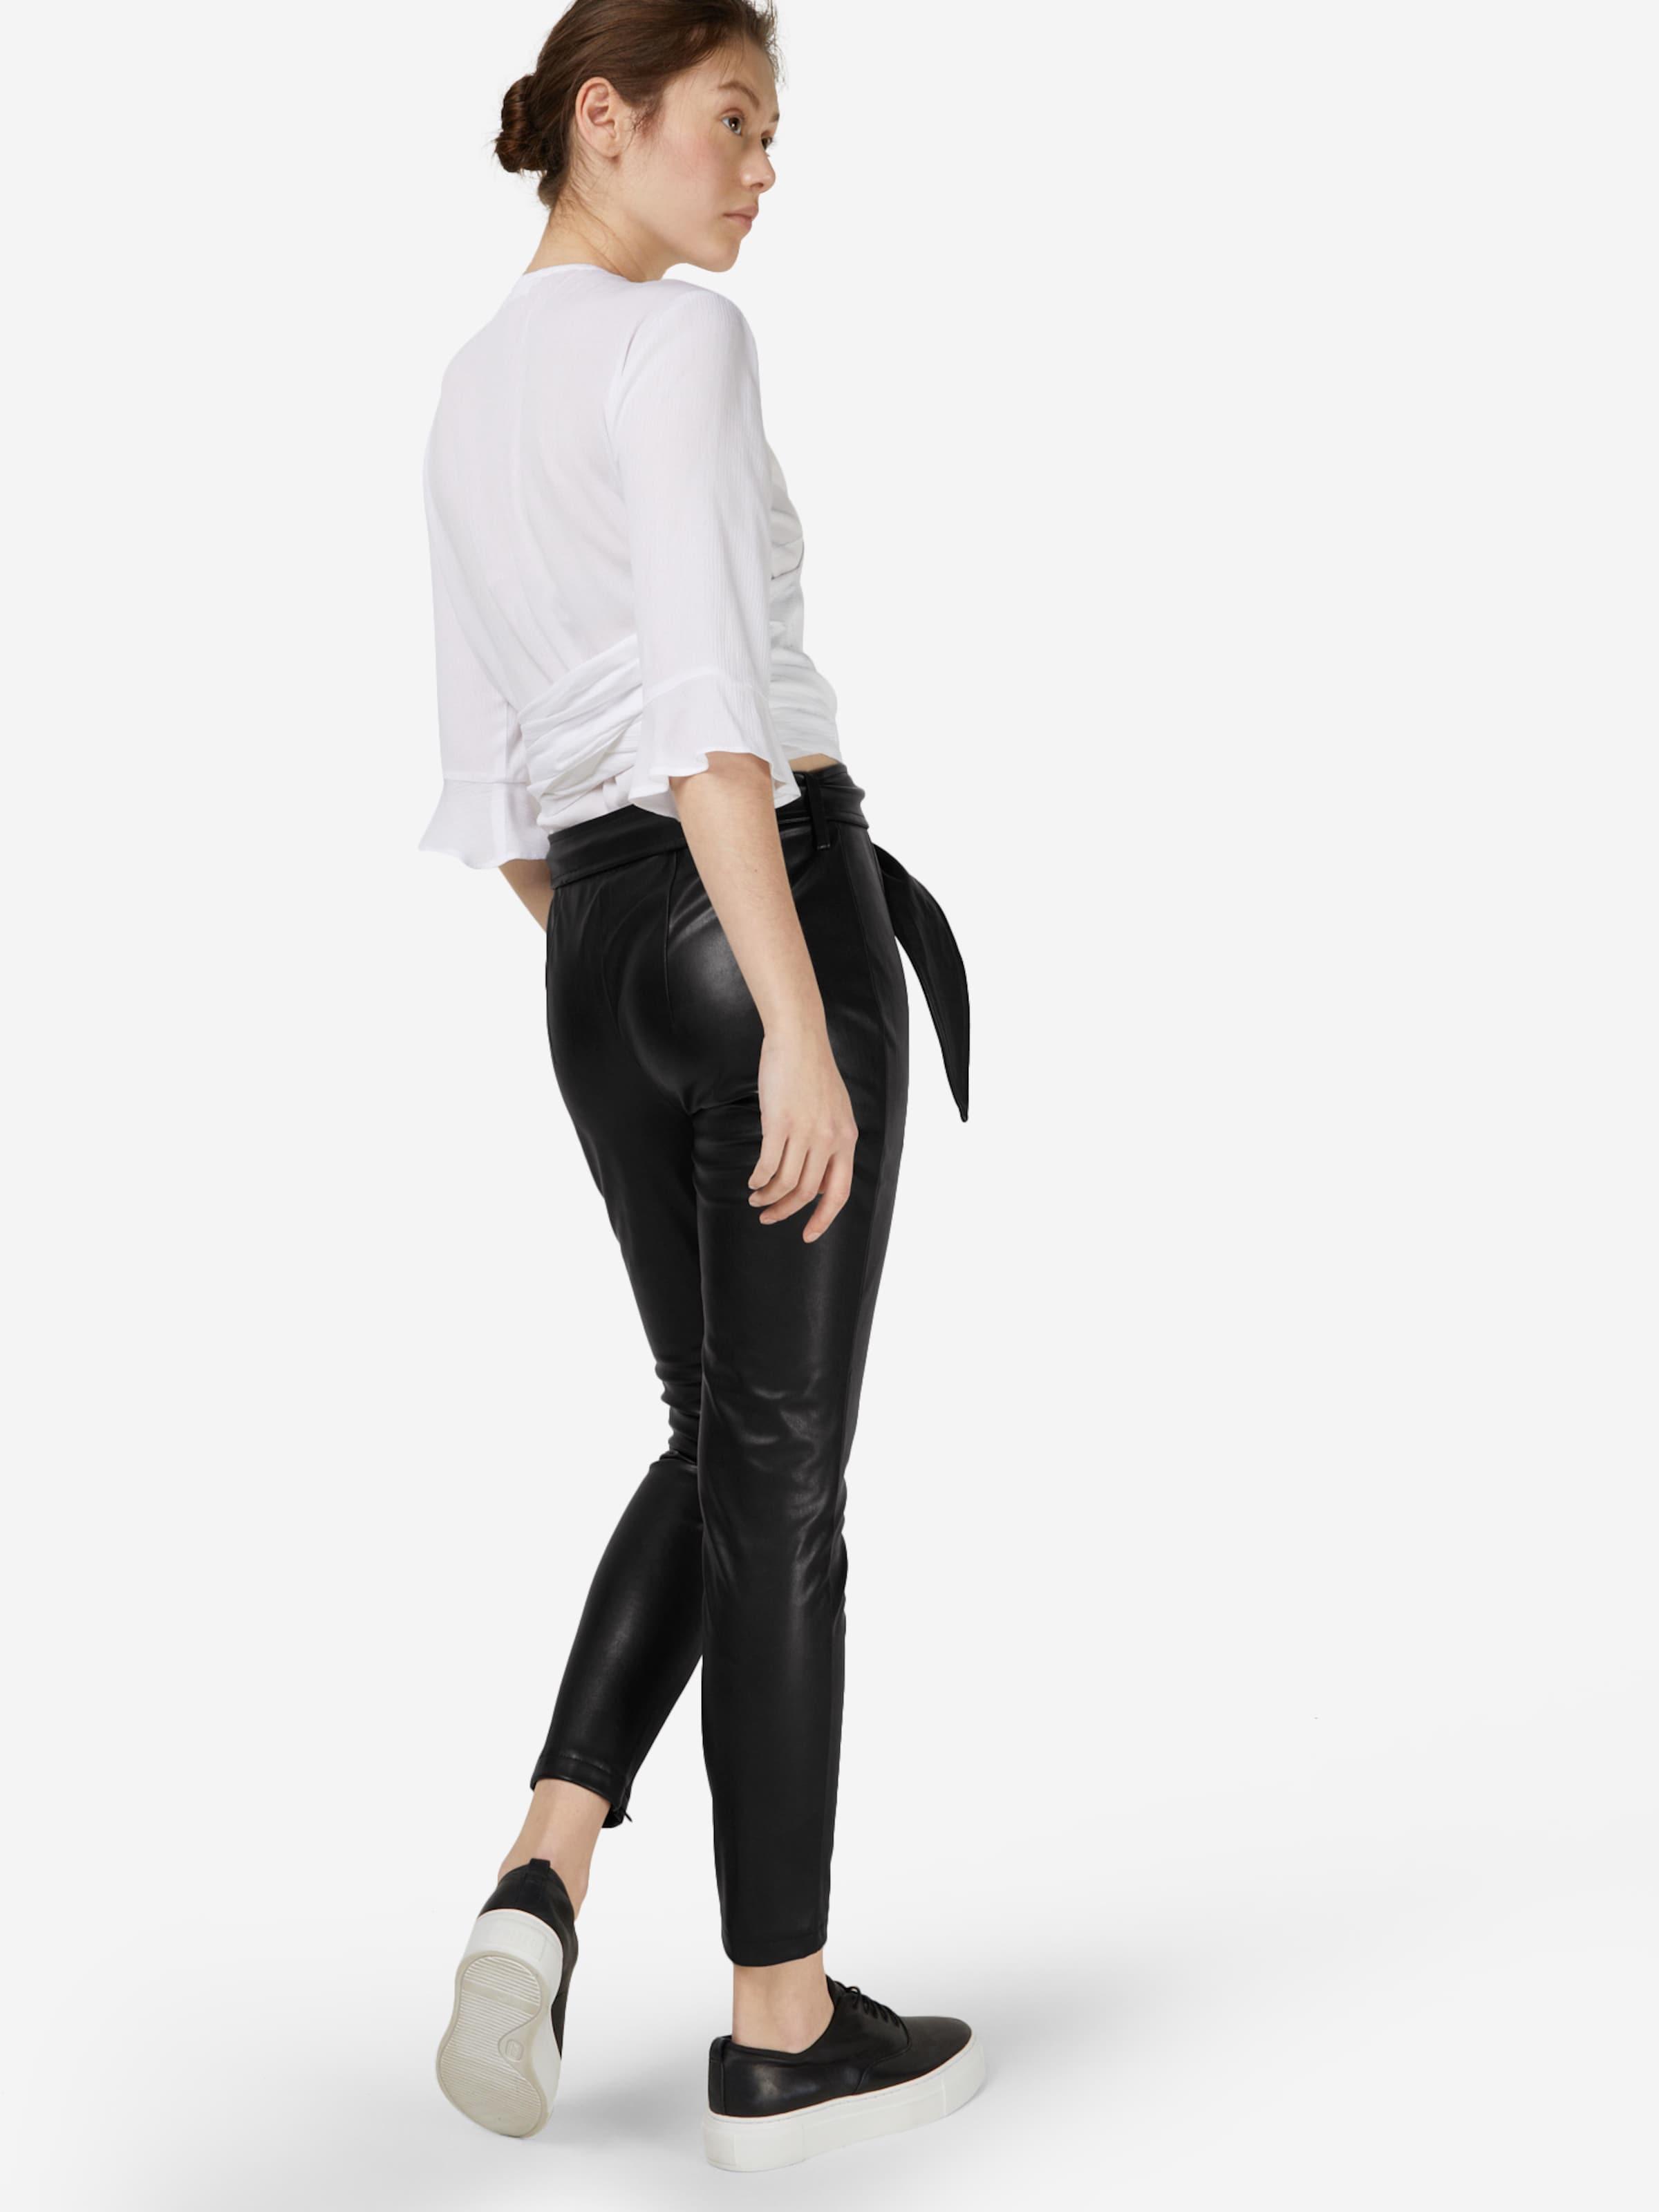 En Pantalon Pantalon Aaiko Noir Aaiko Noir Aaiko En En Noir Pantalon En Pantalon Aaiko dCoexrB